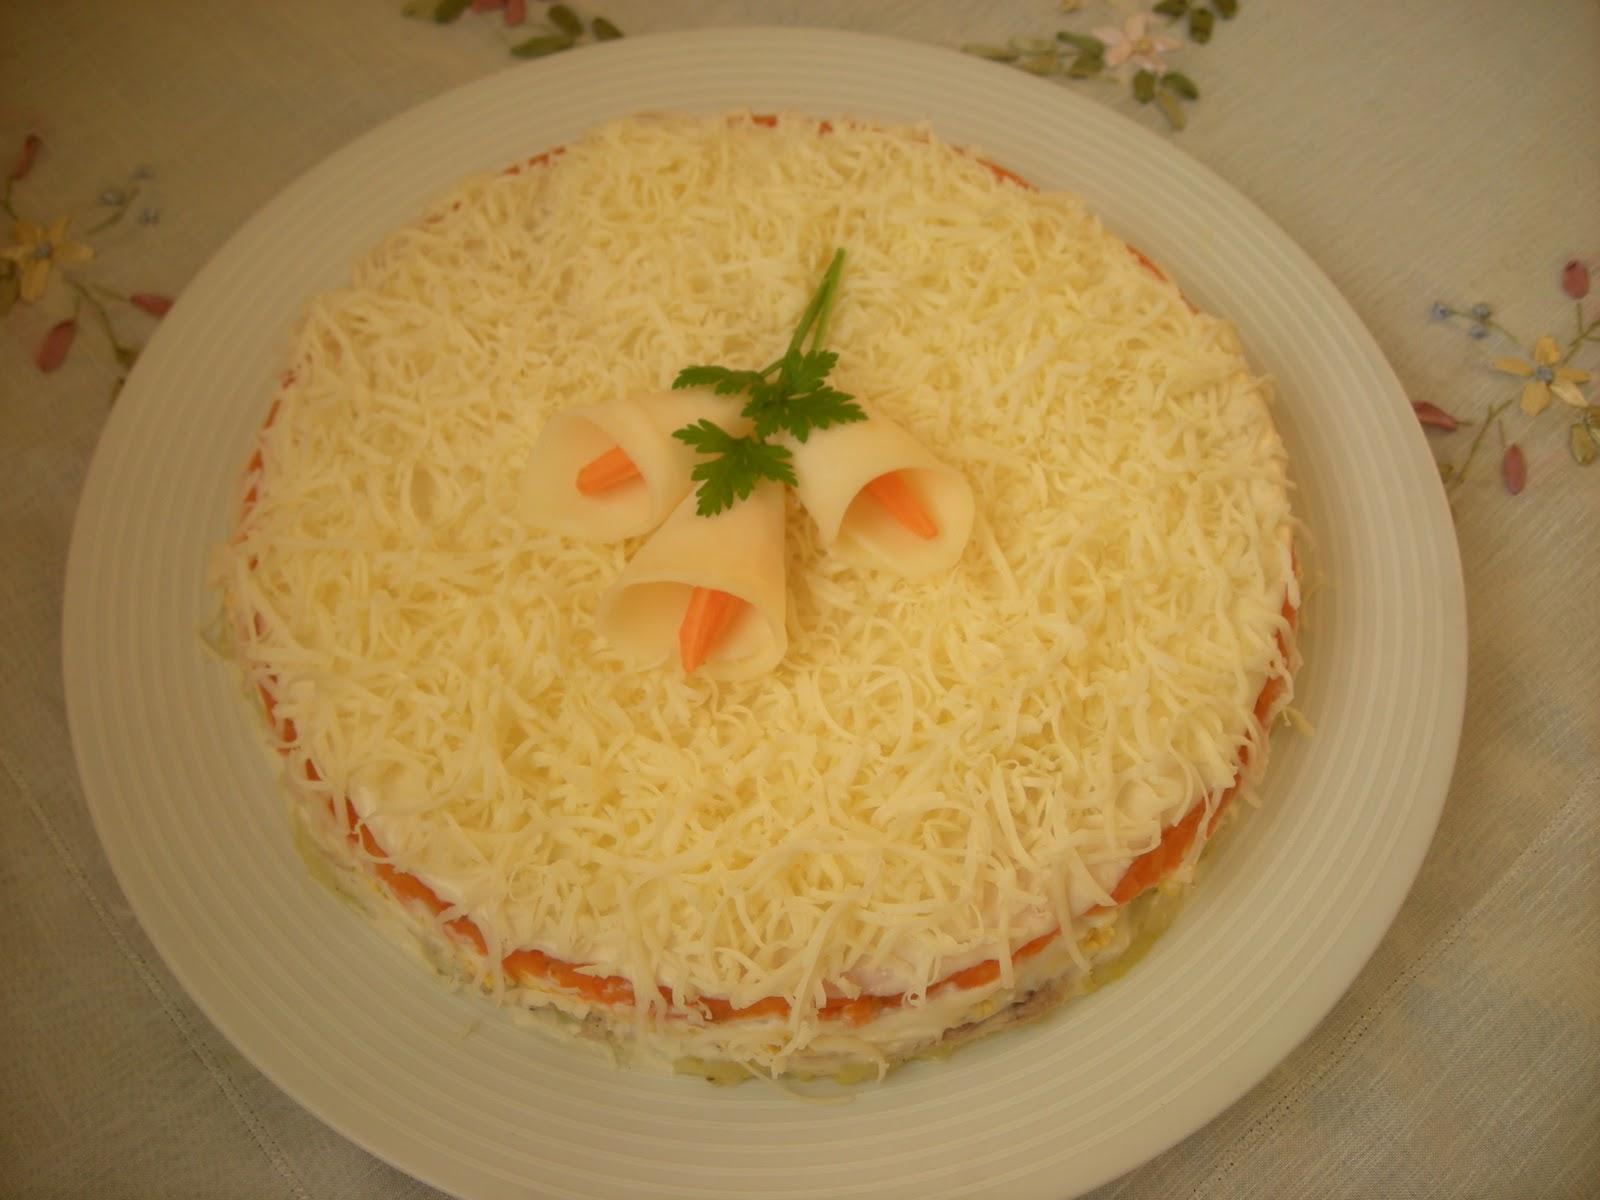 Lezzetli Mimosa salatası, yemek tarifi